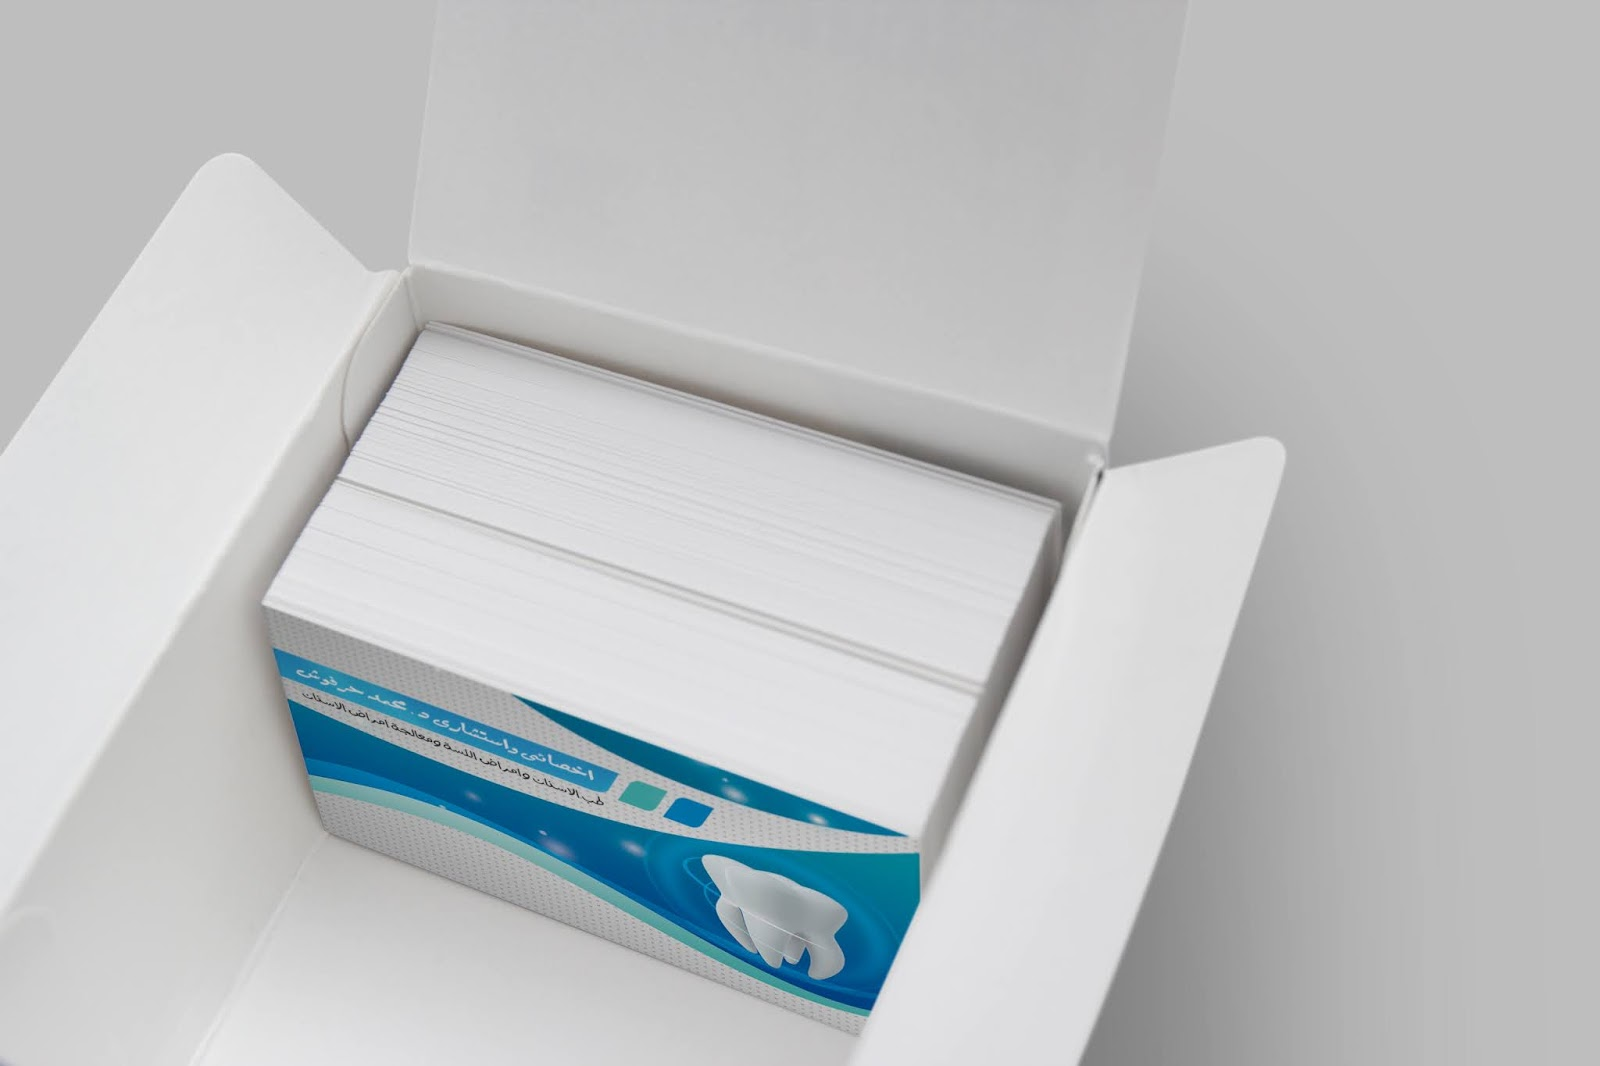 Dental PSD card download - business card psd